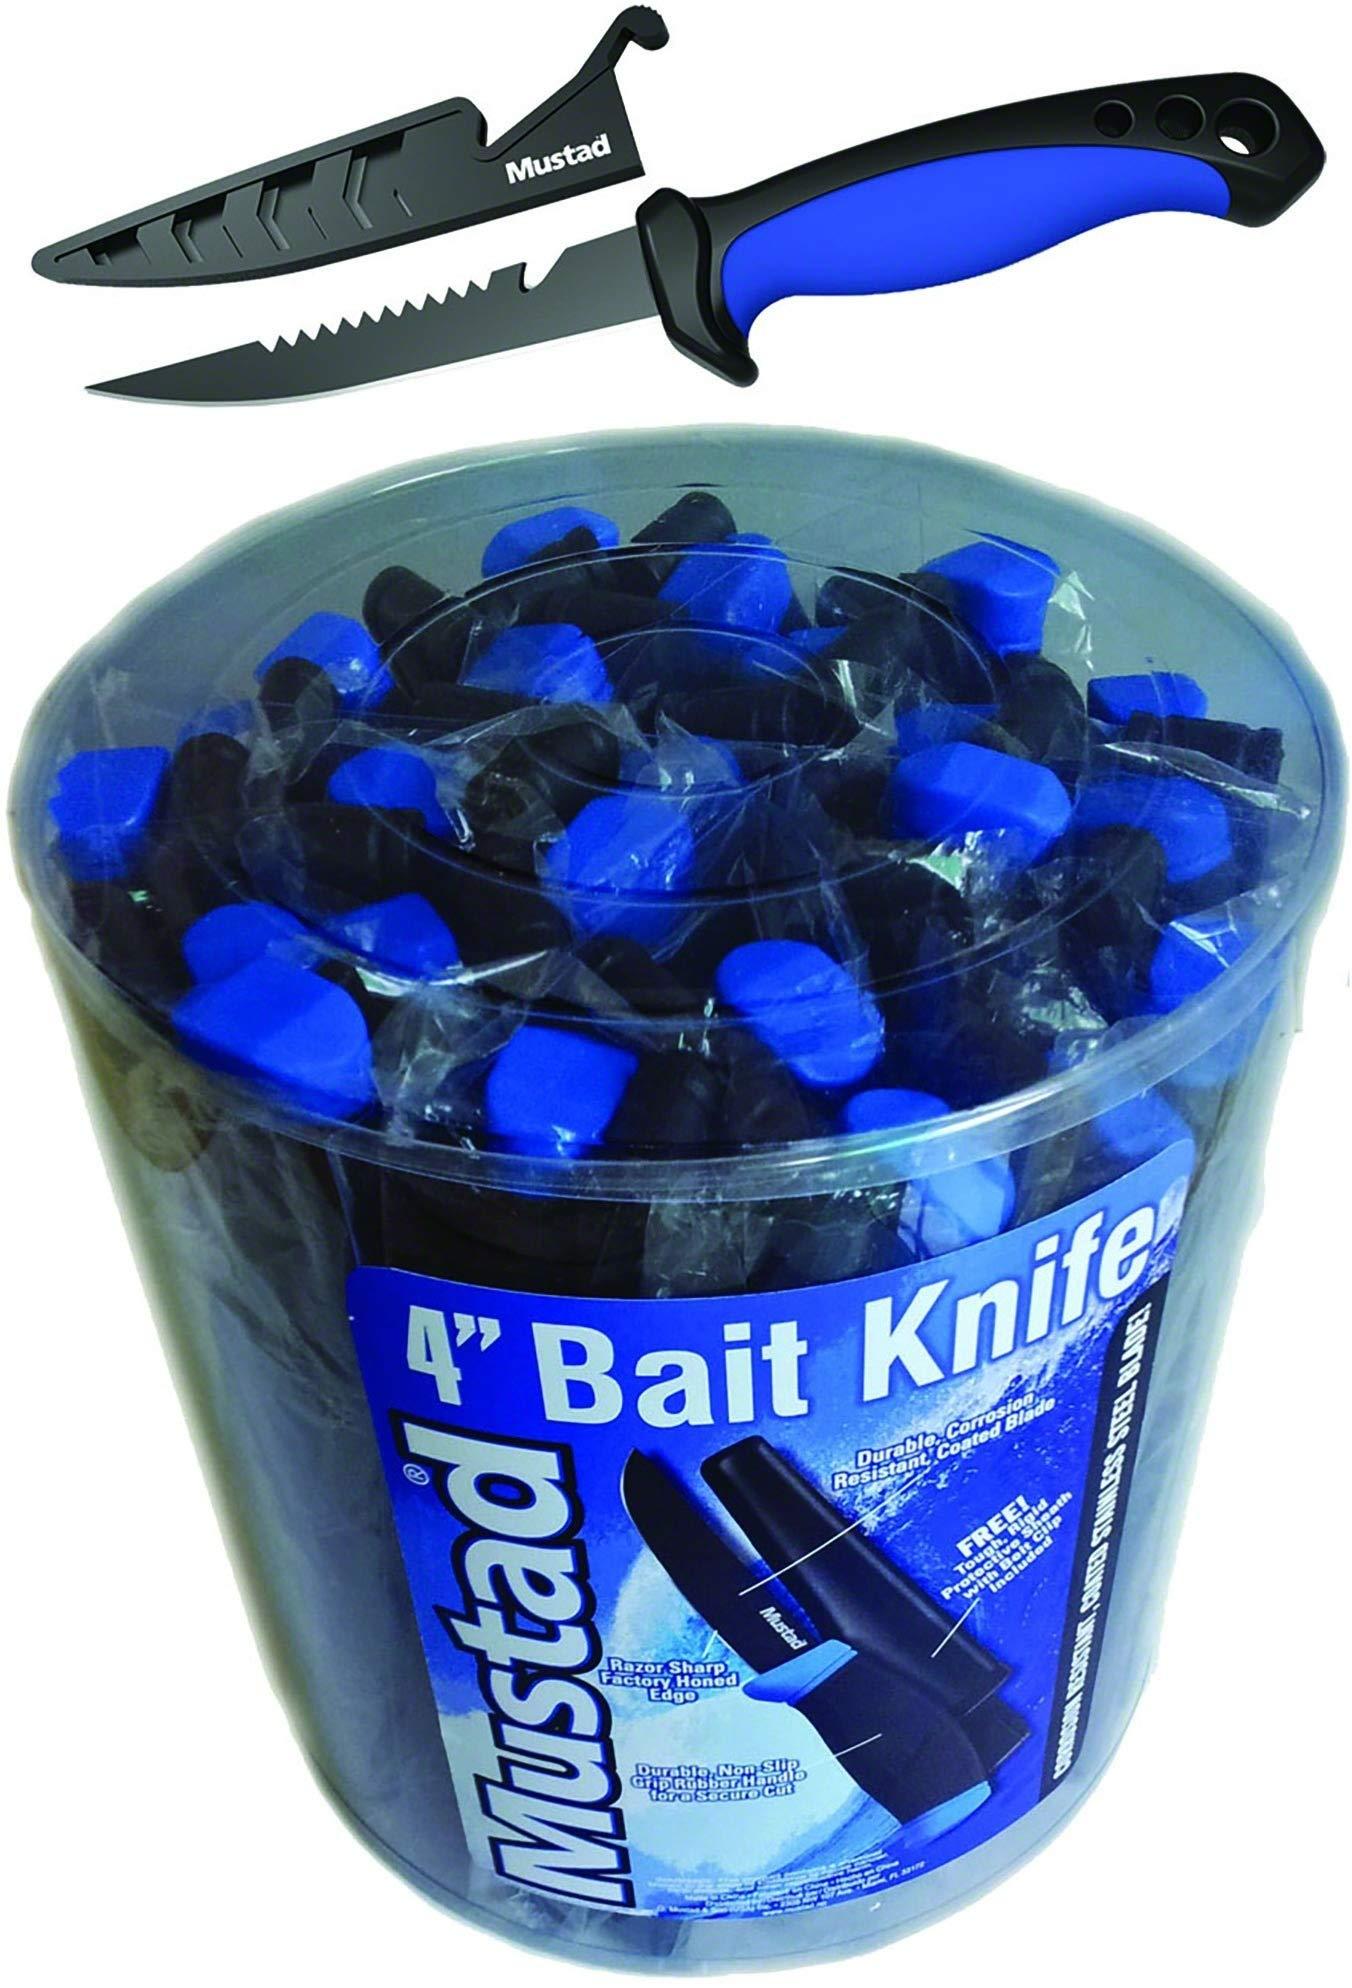 4'' Bait Knife with Sheath 24Pc Bucket